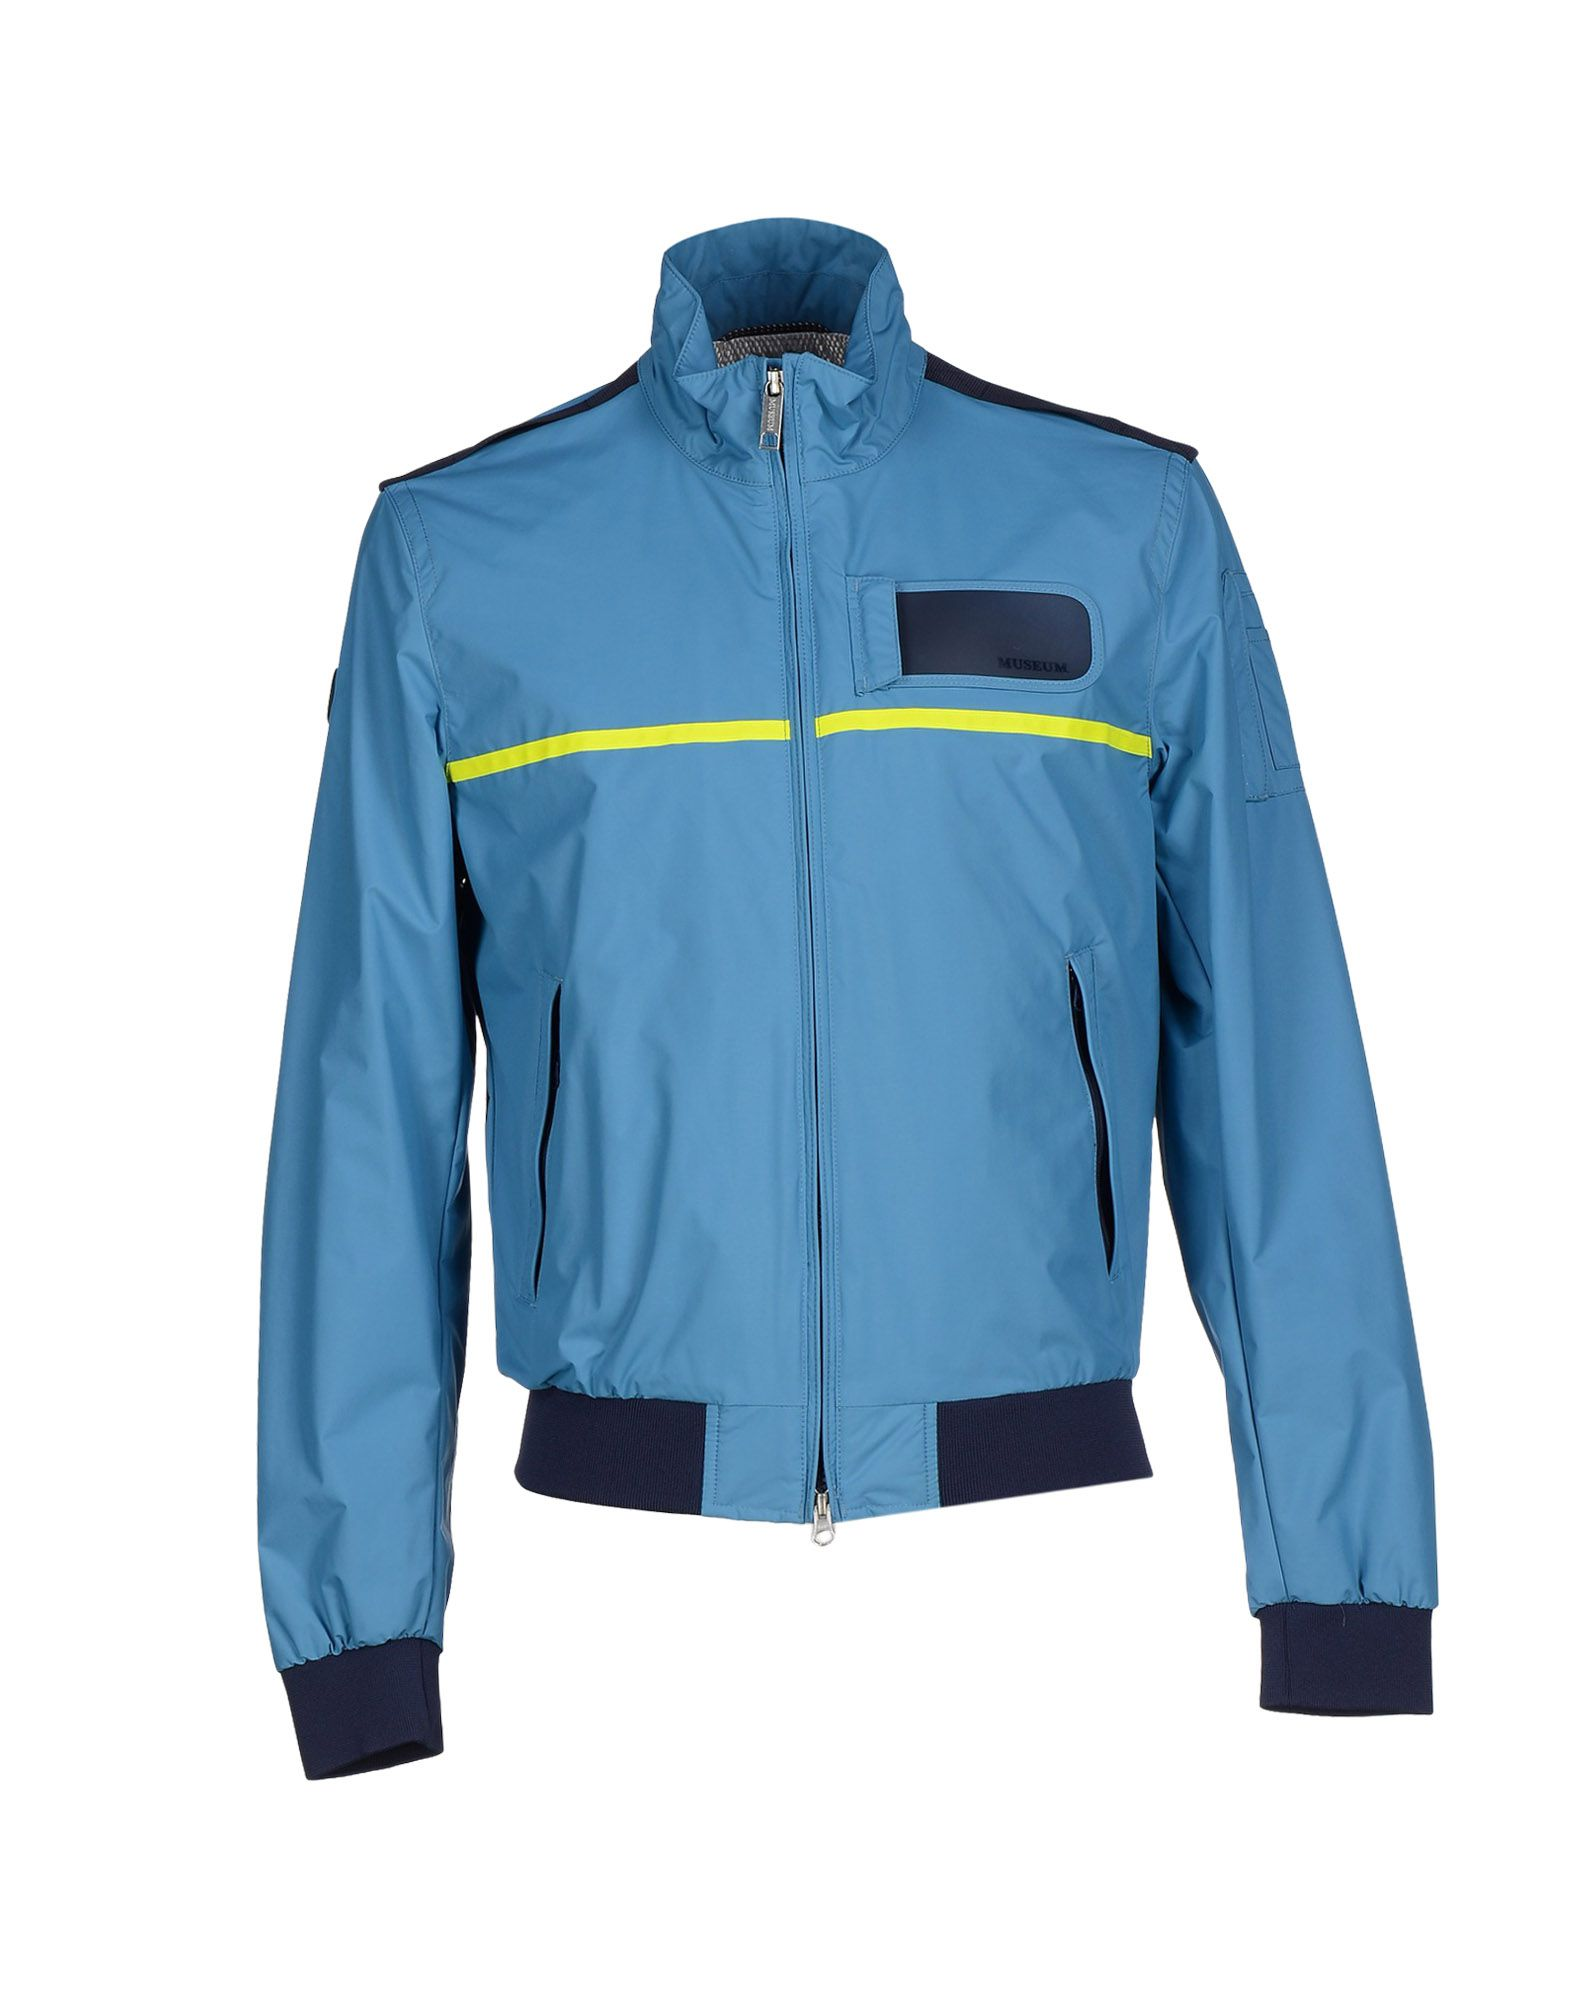 MUSEUM Jackets in Blue